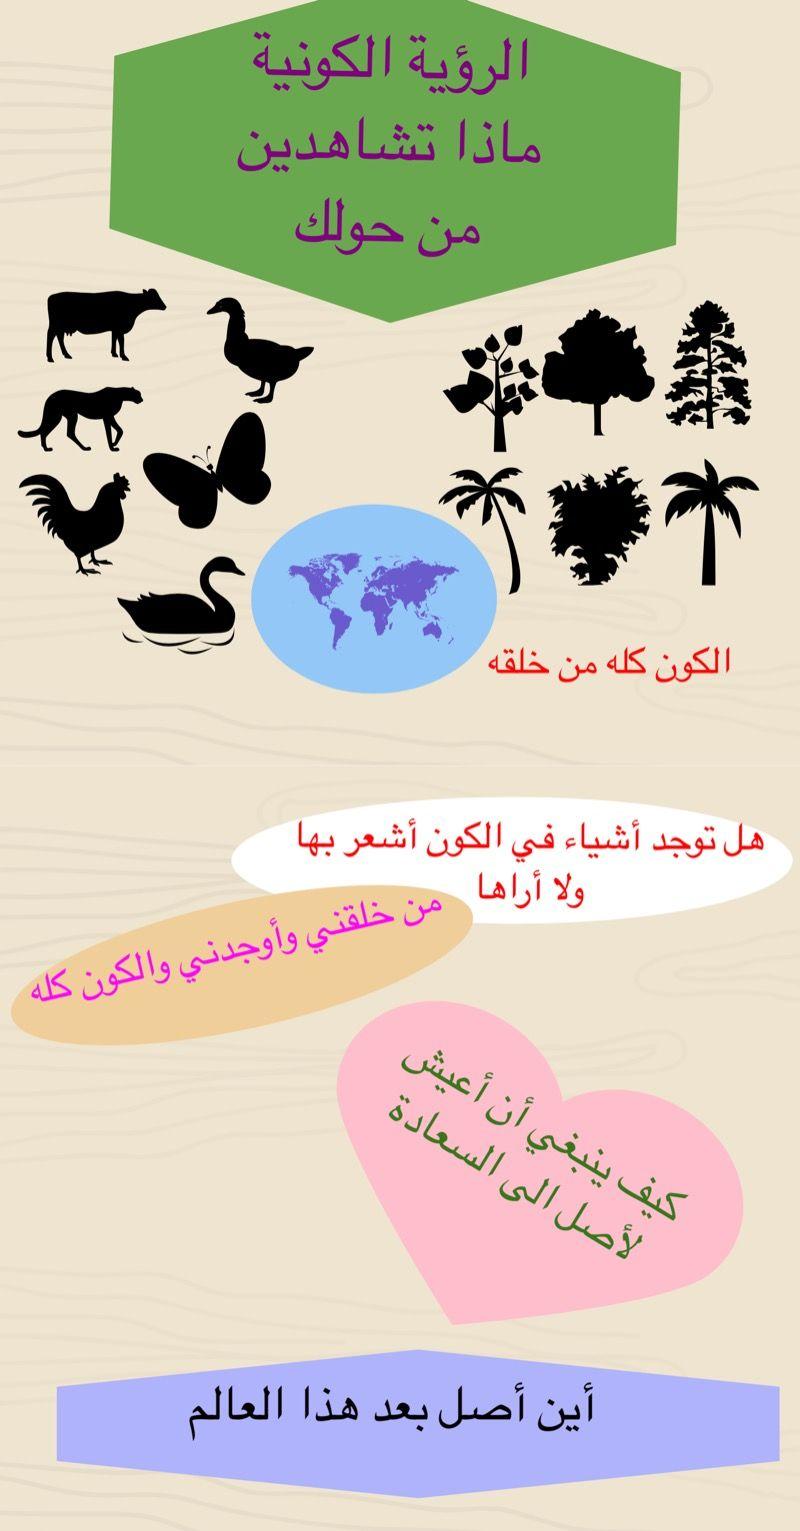 Pin By Imammahdy241 On المدرسة الدينية Movie Posters Poster Art